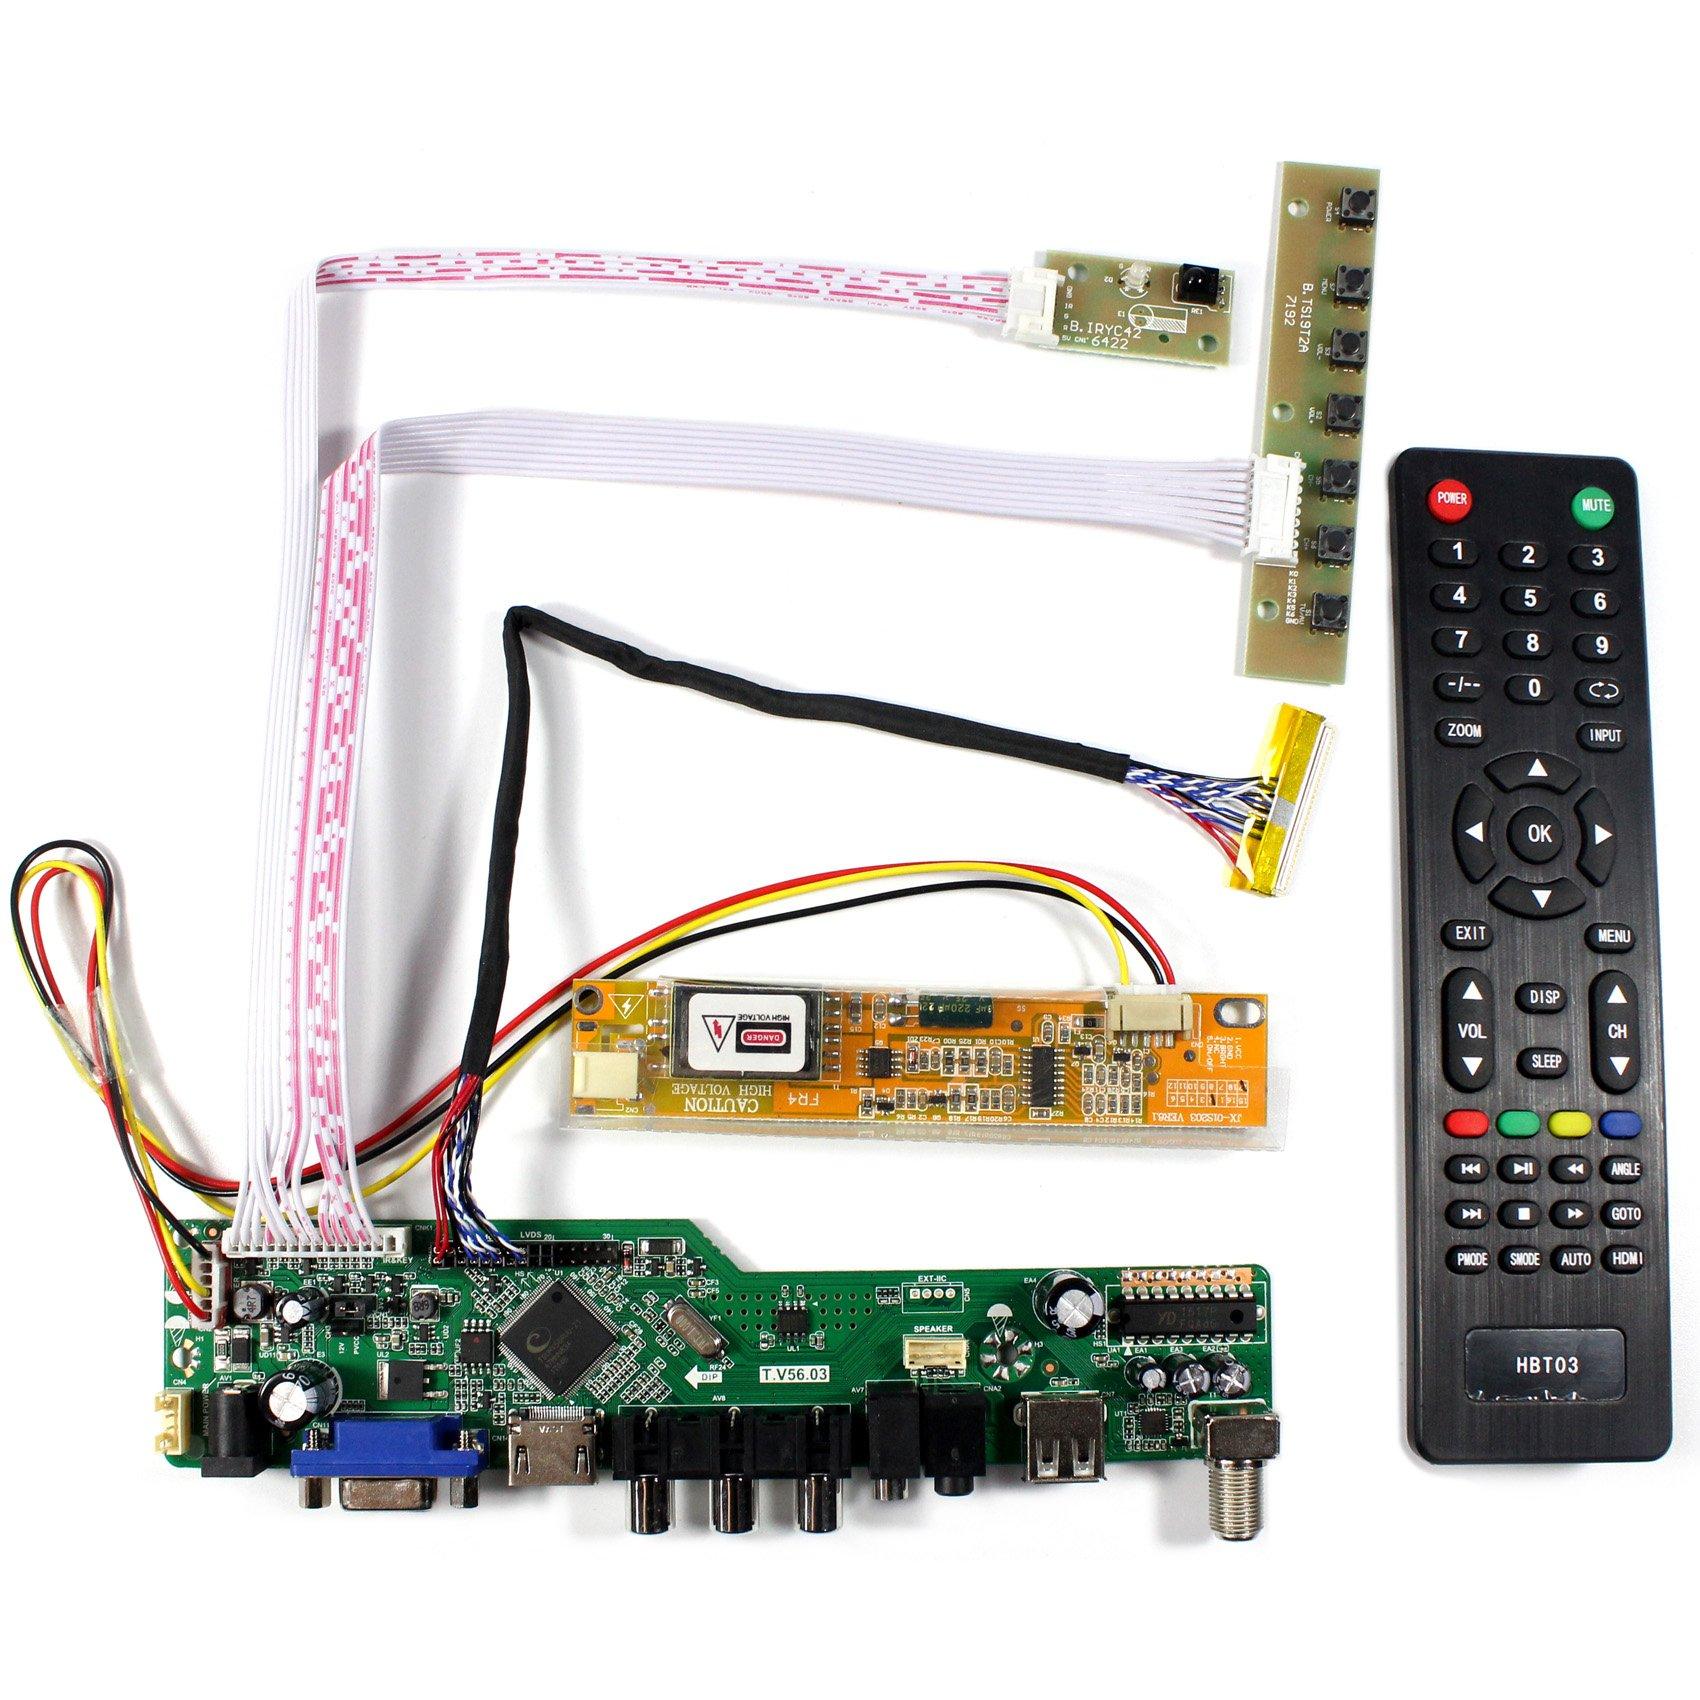 Controladora Lcd Hdmi 14.1 15.4 1280x800 Ltn154w1 Lp154wx4